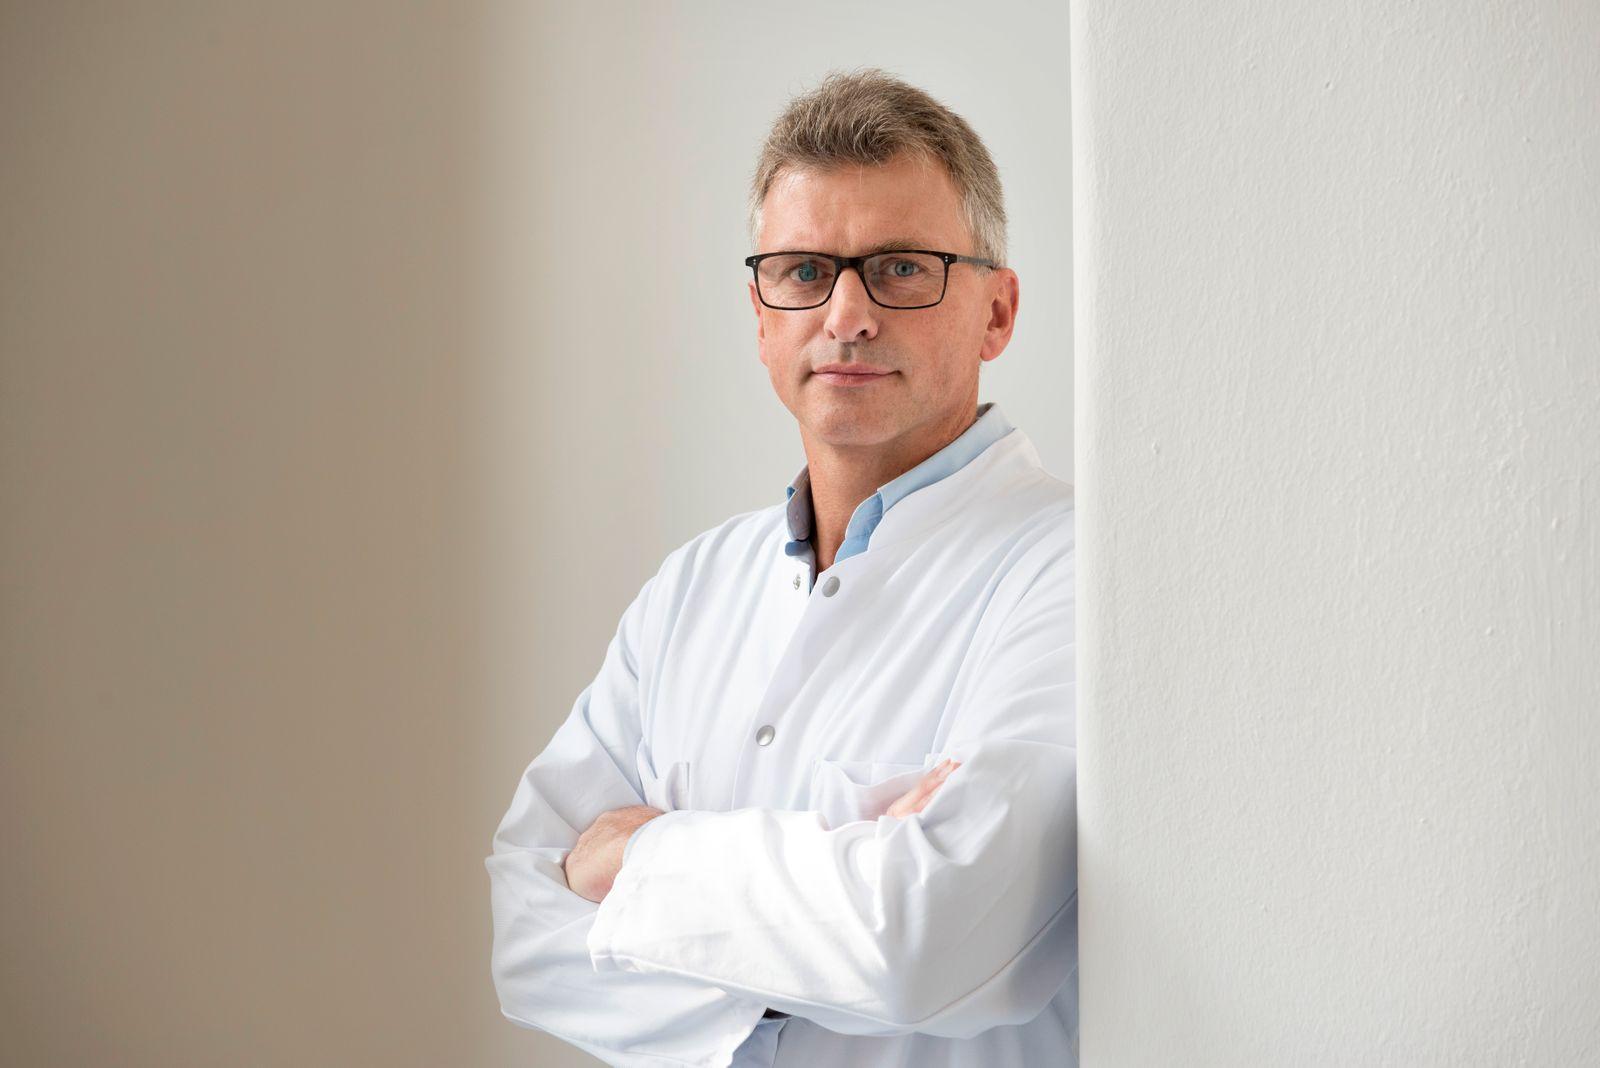 Prof. Dr. med. Matthias Laudes